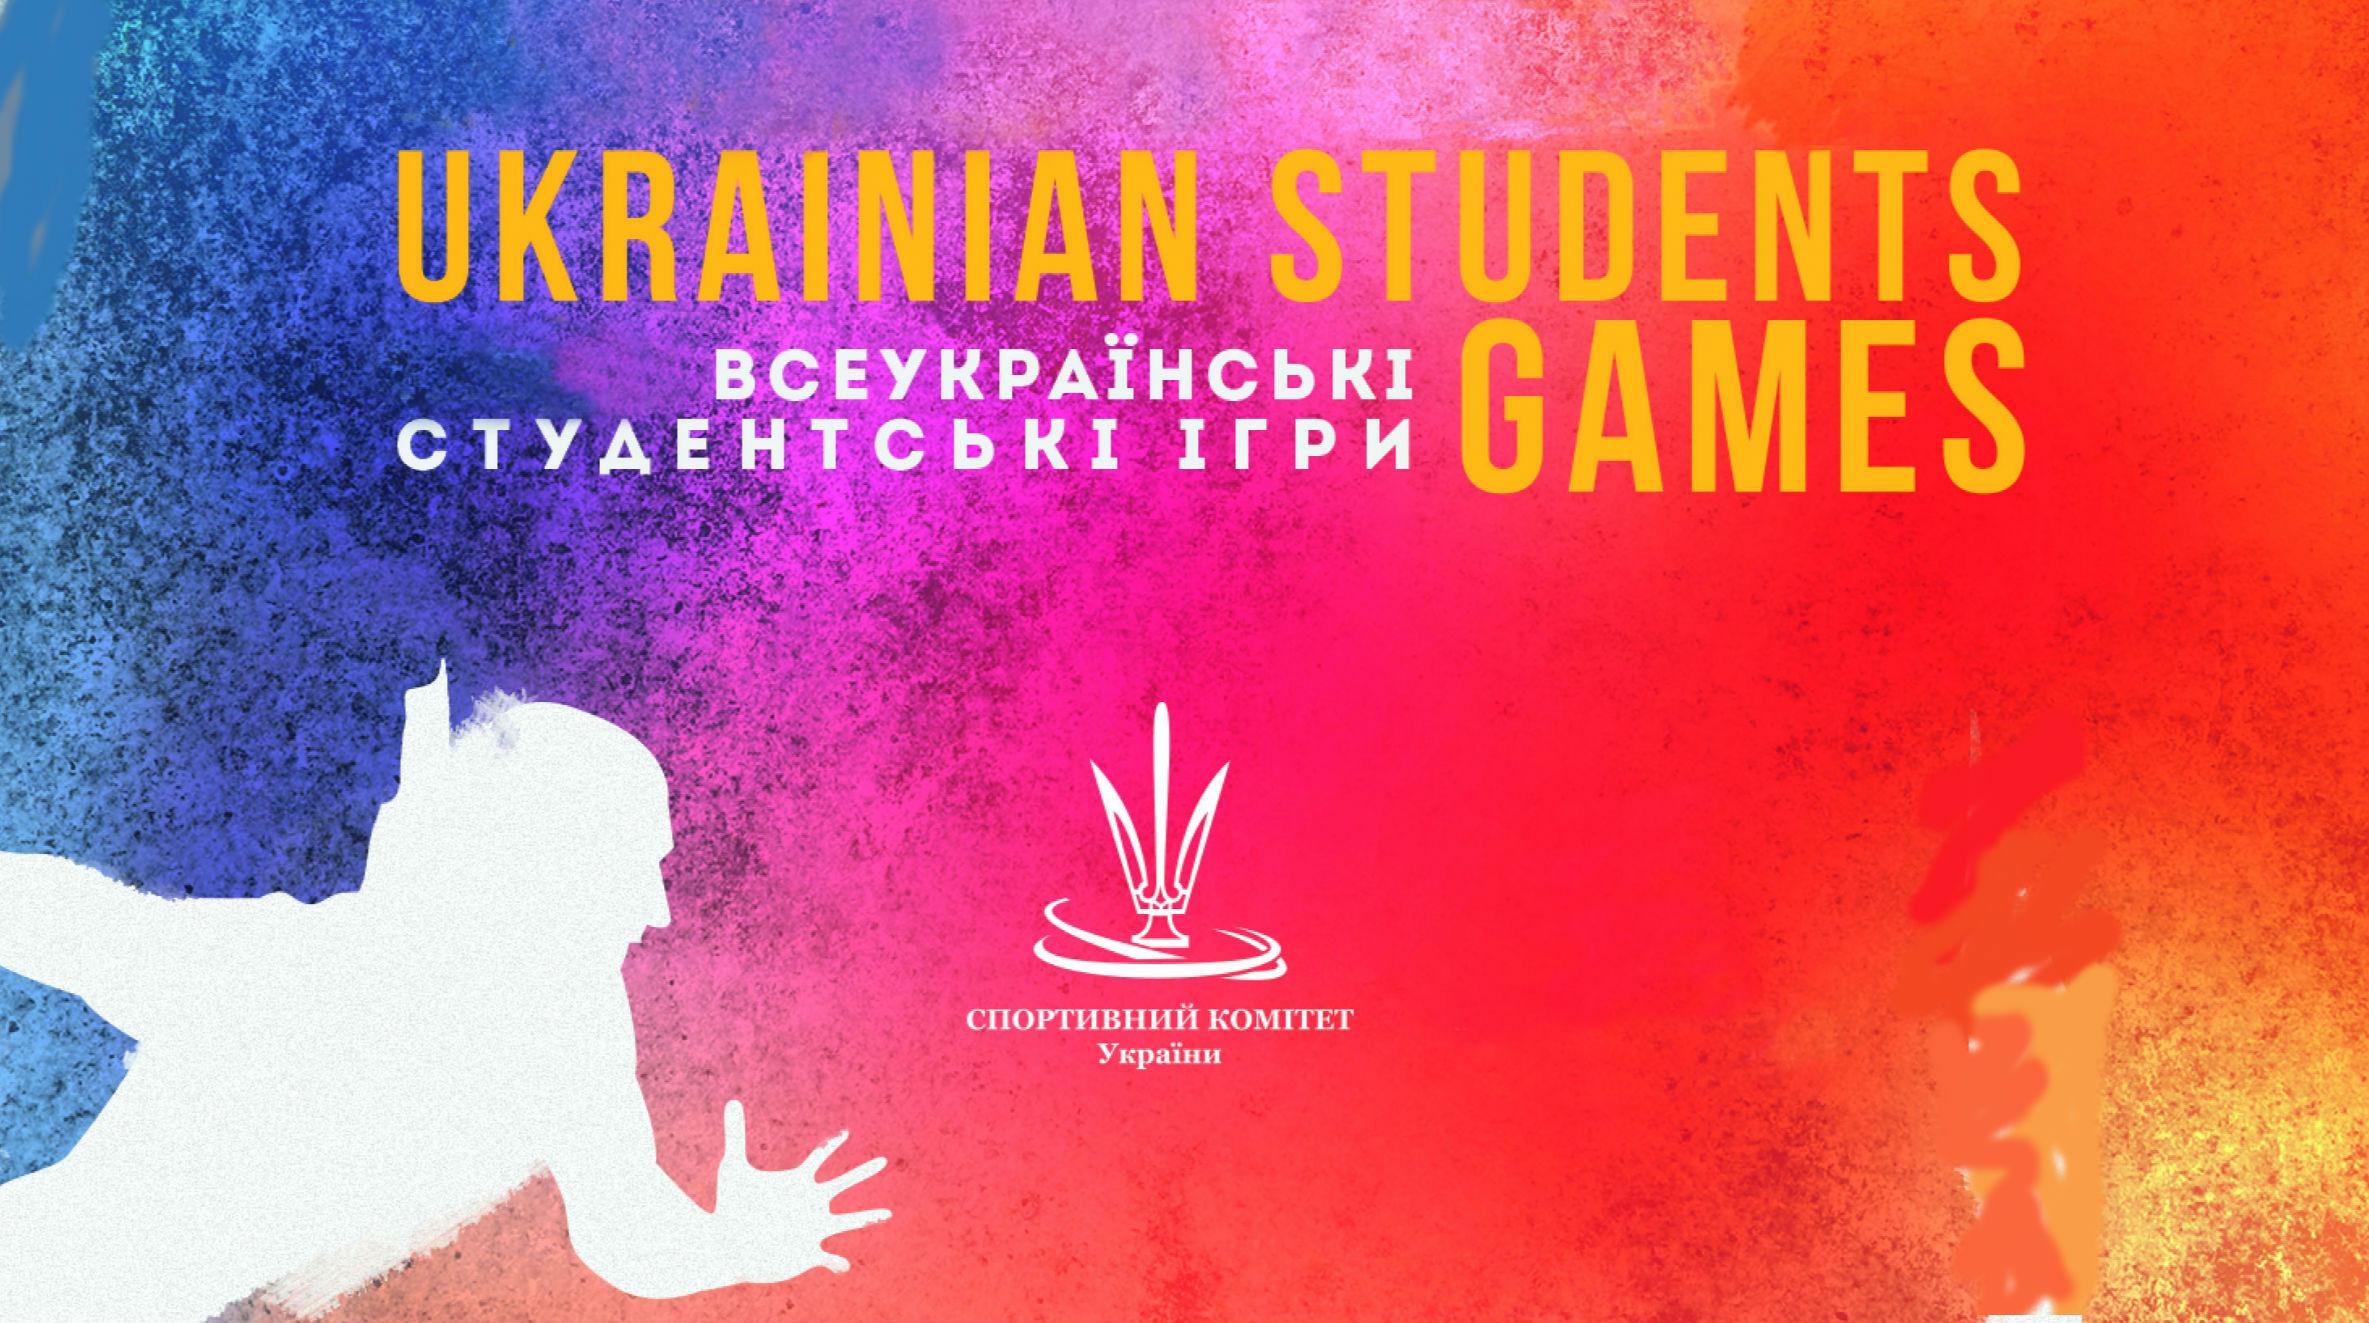 ukrainian_students_games